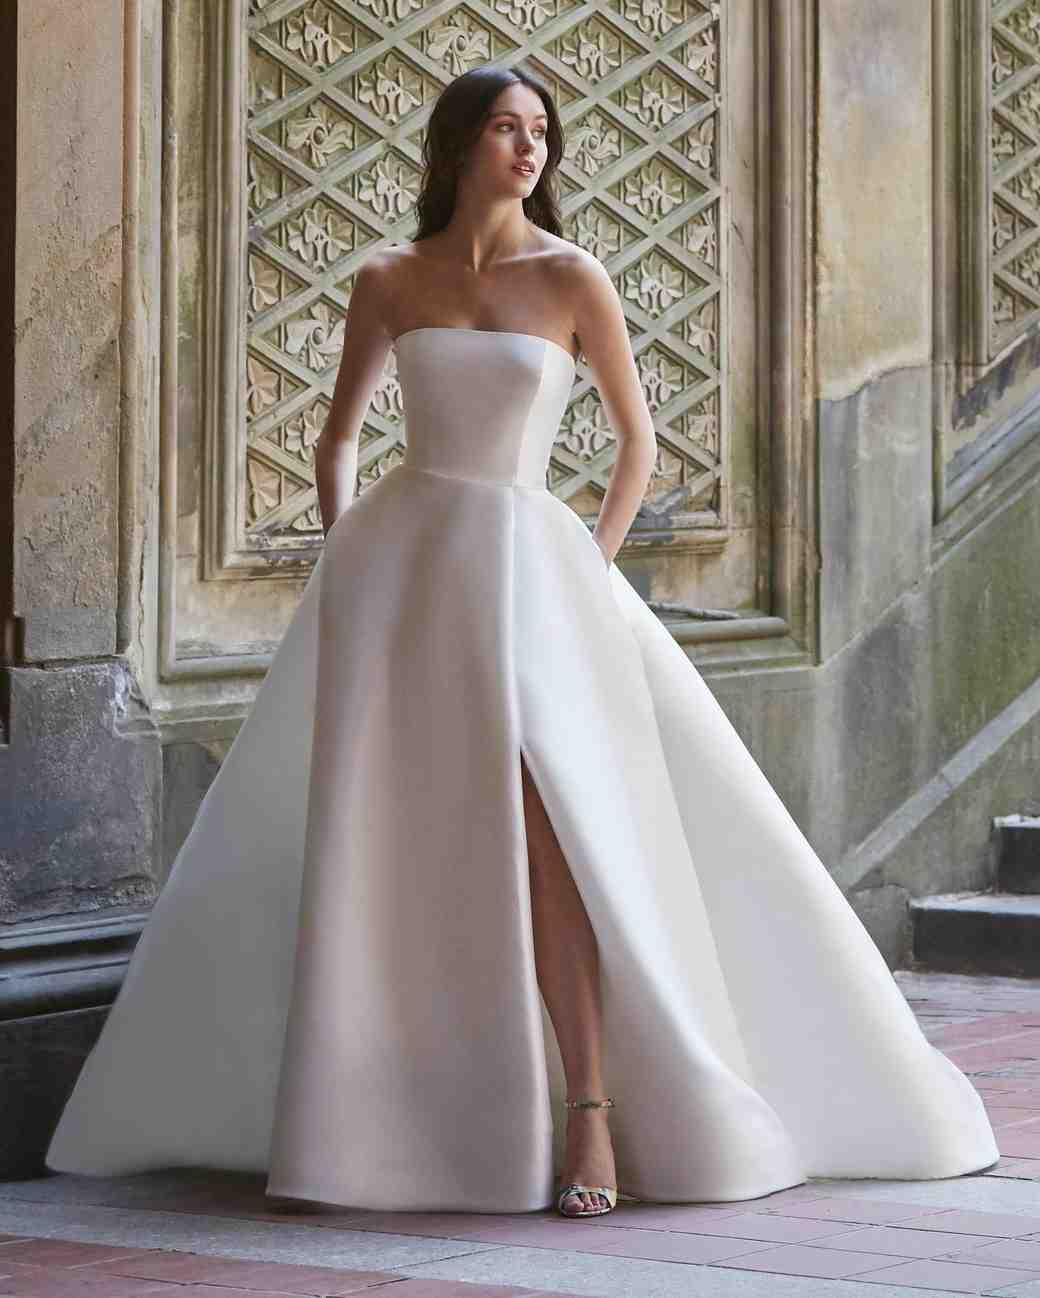 Pretty Wedding Dresses: 88 Pretty Wedding Dresses With Pockets